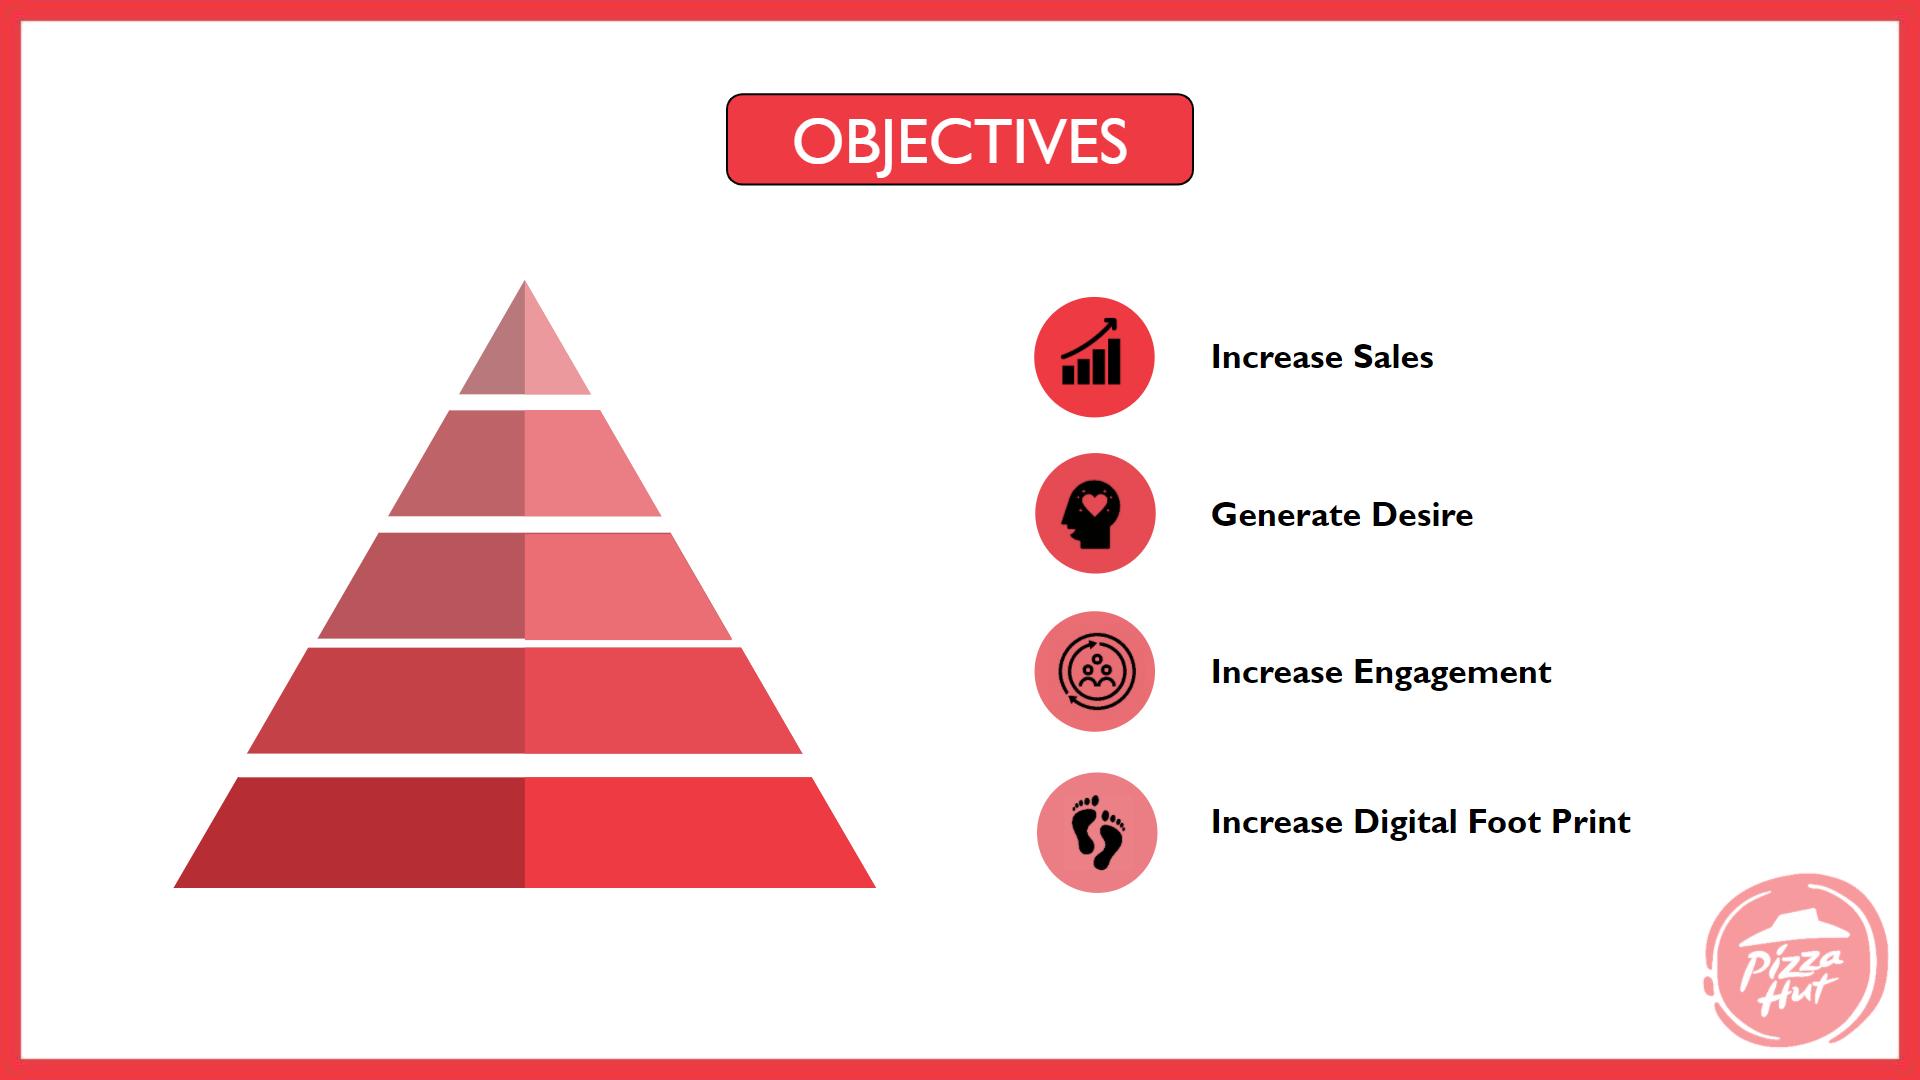 pizza hut marketing strategy Campaign Objectives - Pizza Hut Marketing and Advertising Strategy